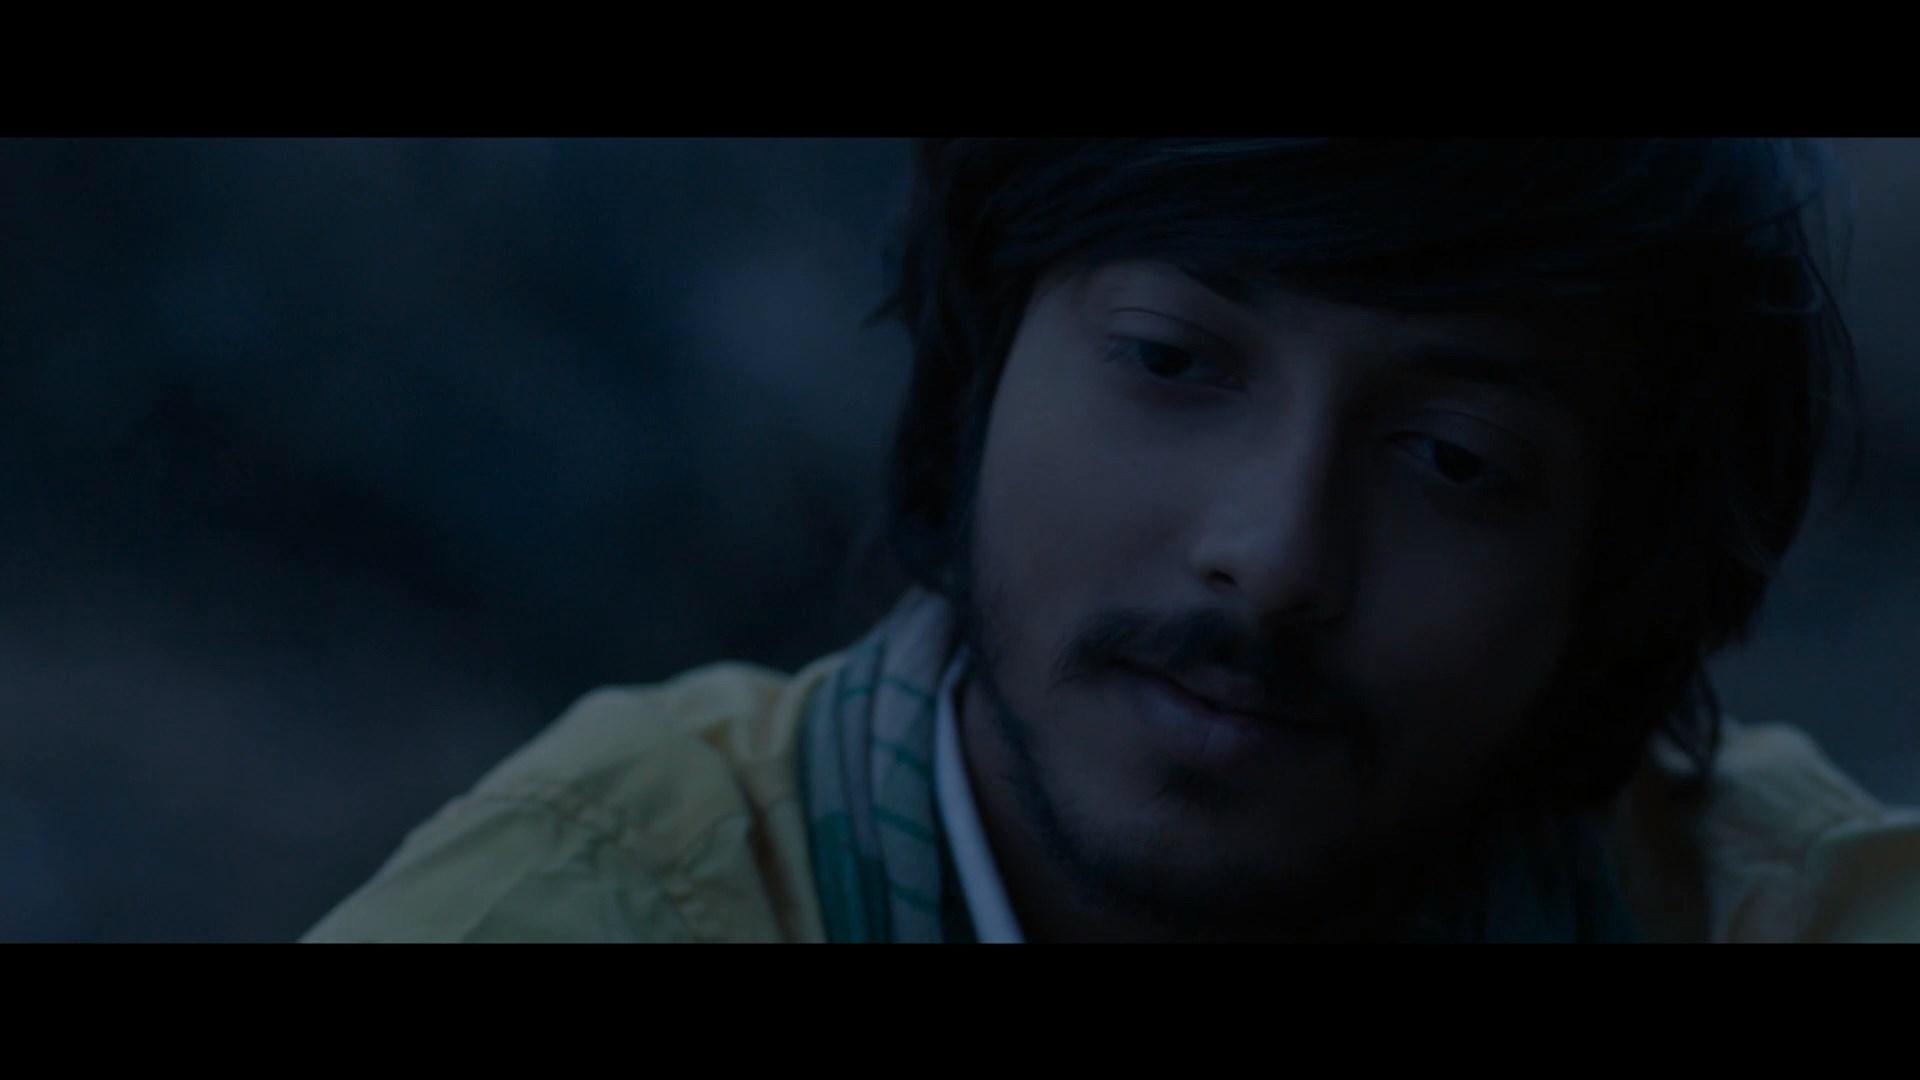 Uronchondi.2018.Bengali.1080p.WEB.DL.AVC.AAC.DUS.ICTV.mkv snapshot 01.04.58.000